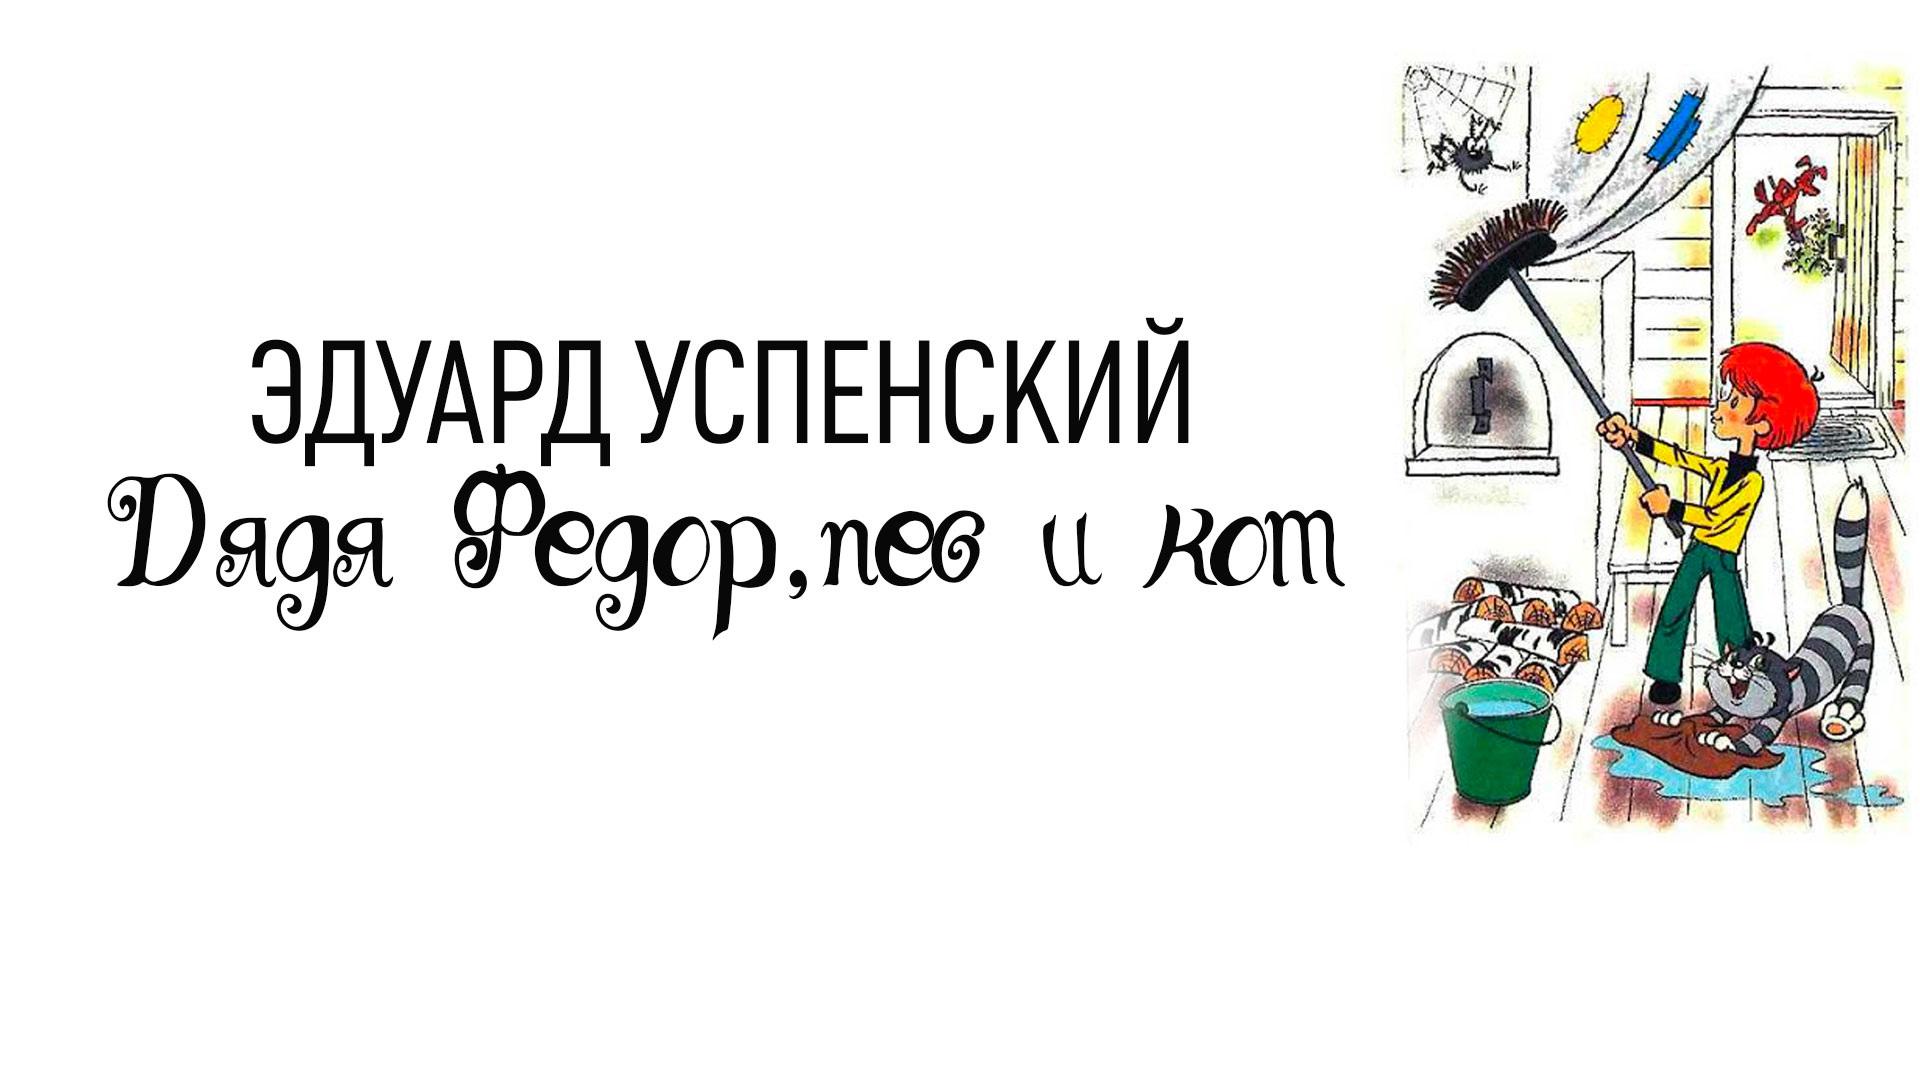 Эдуард Успенский. Дядя Федор, пес и кот